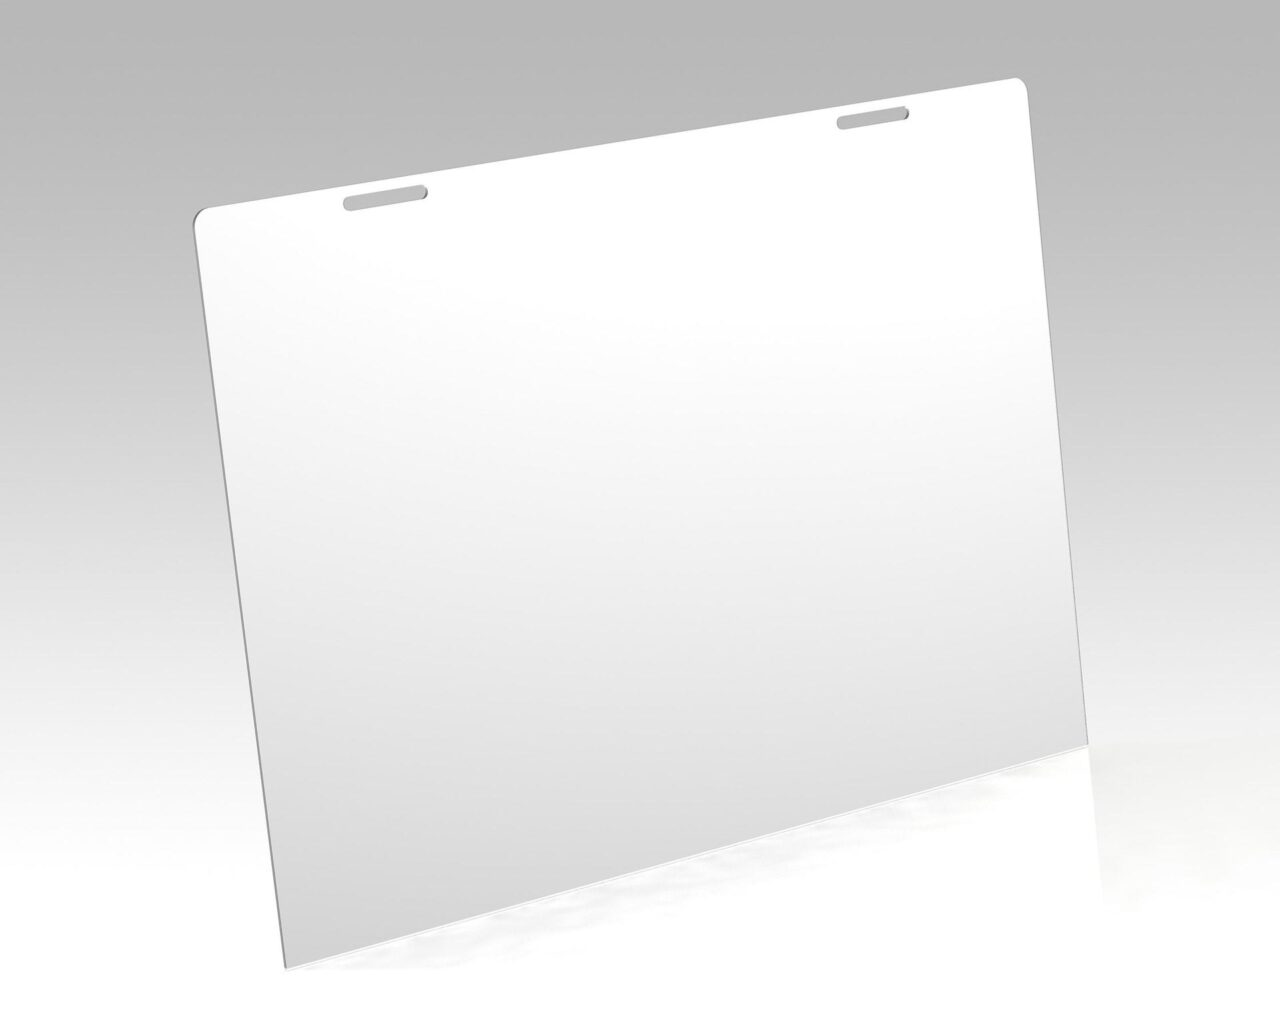 PEK3 Easytube Plastic Accessories LA-C